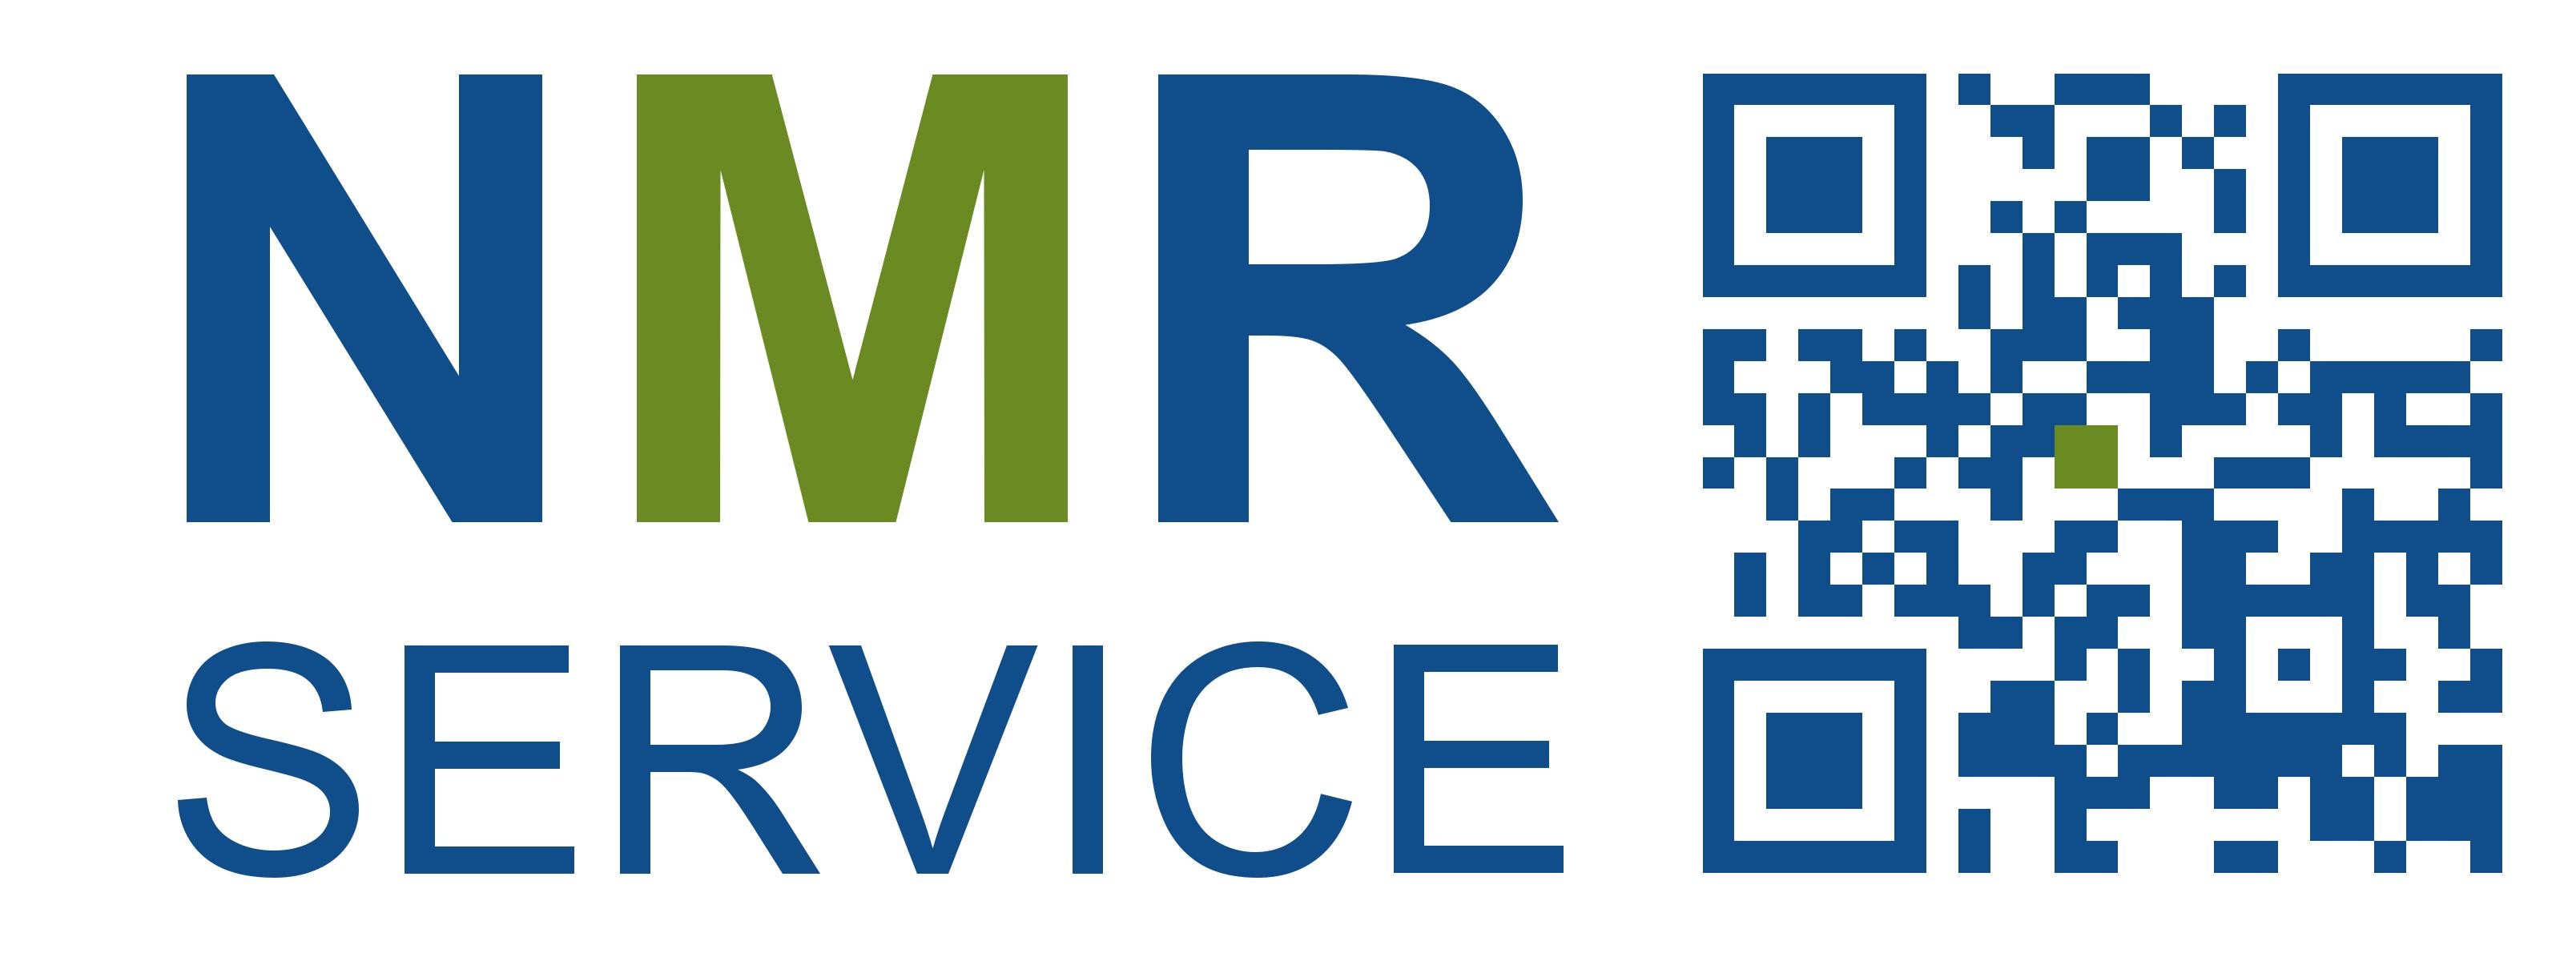 NMR Service GmbH Logo 2018.png